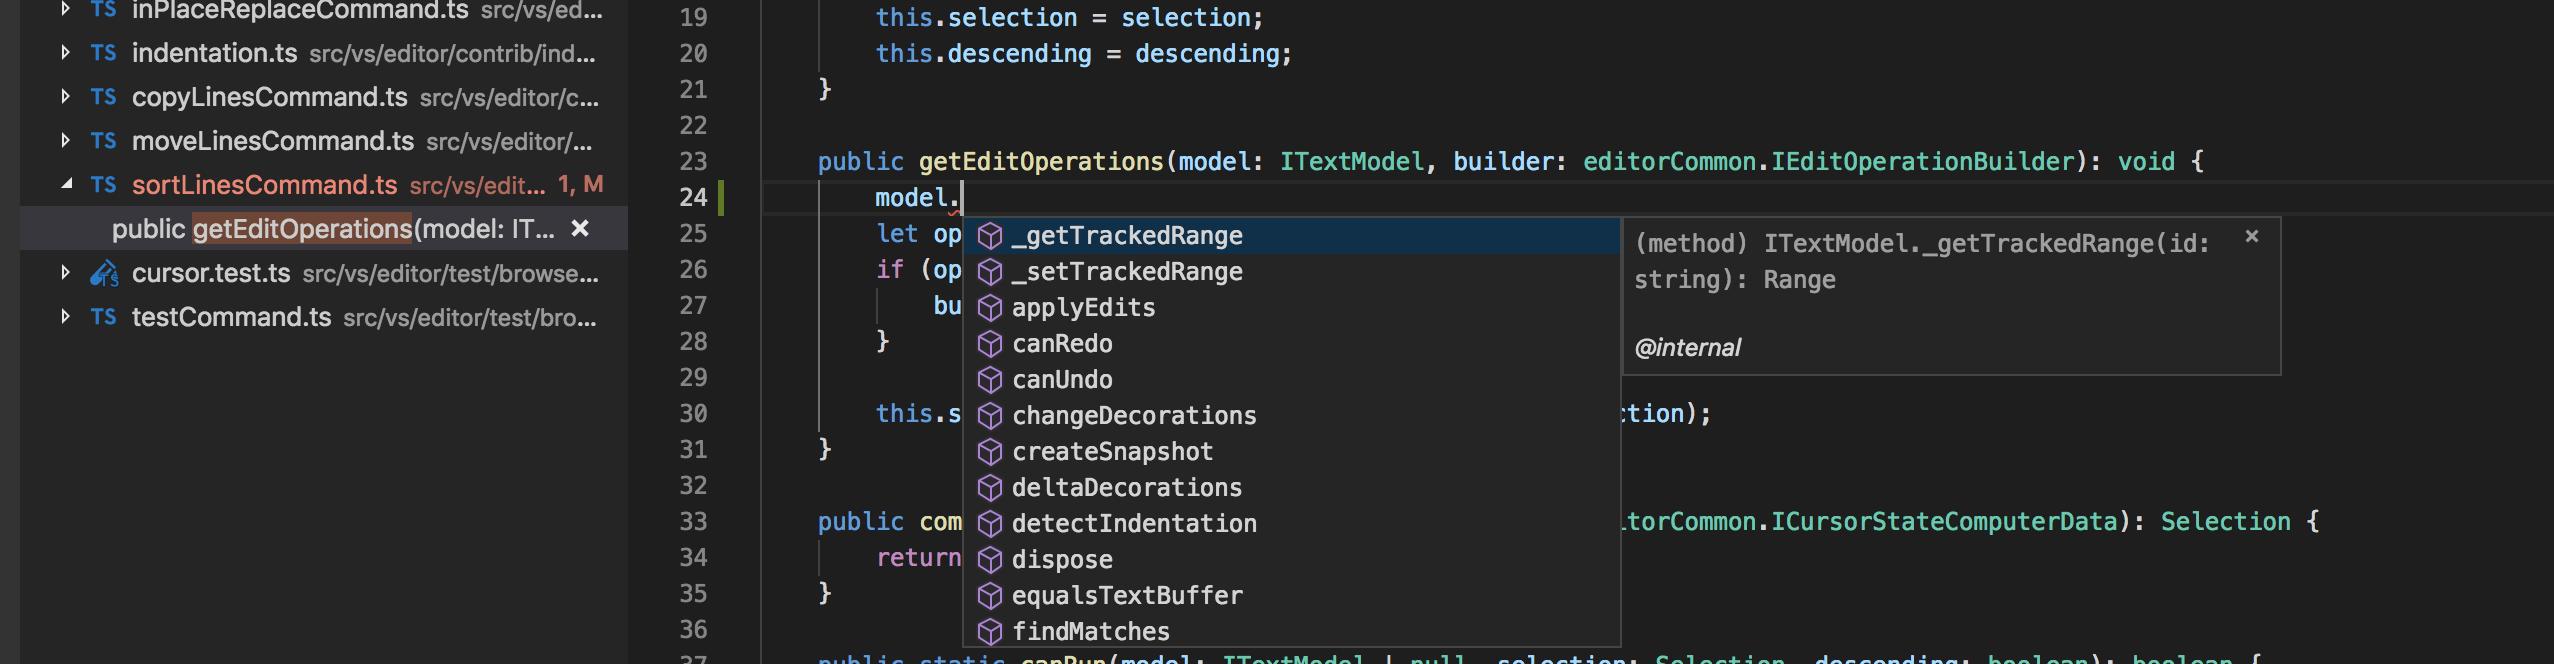 Visual Studio Code: public getEditOperations